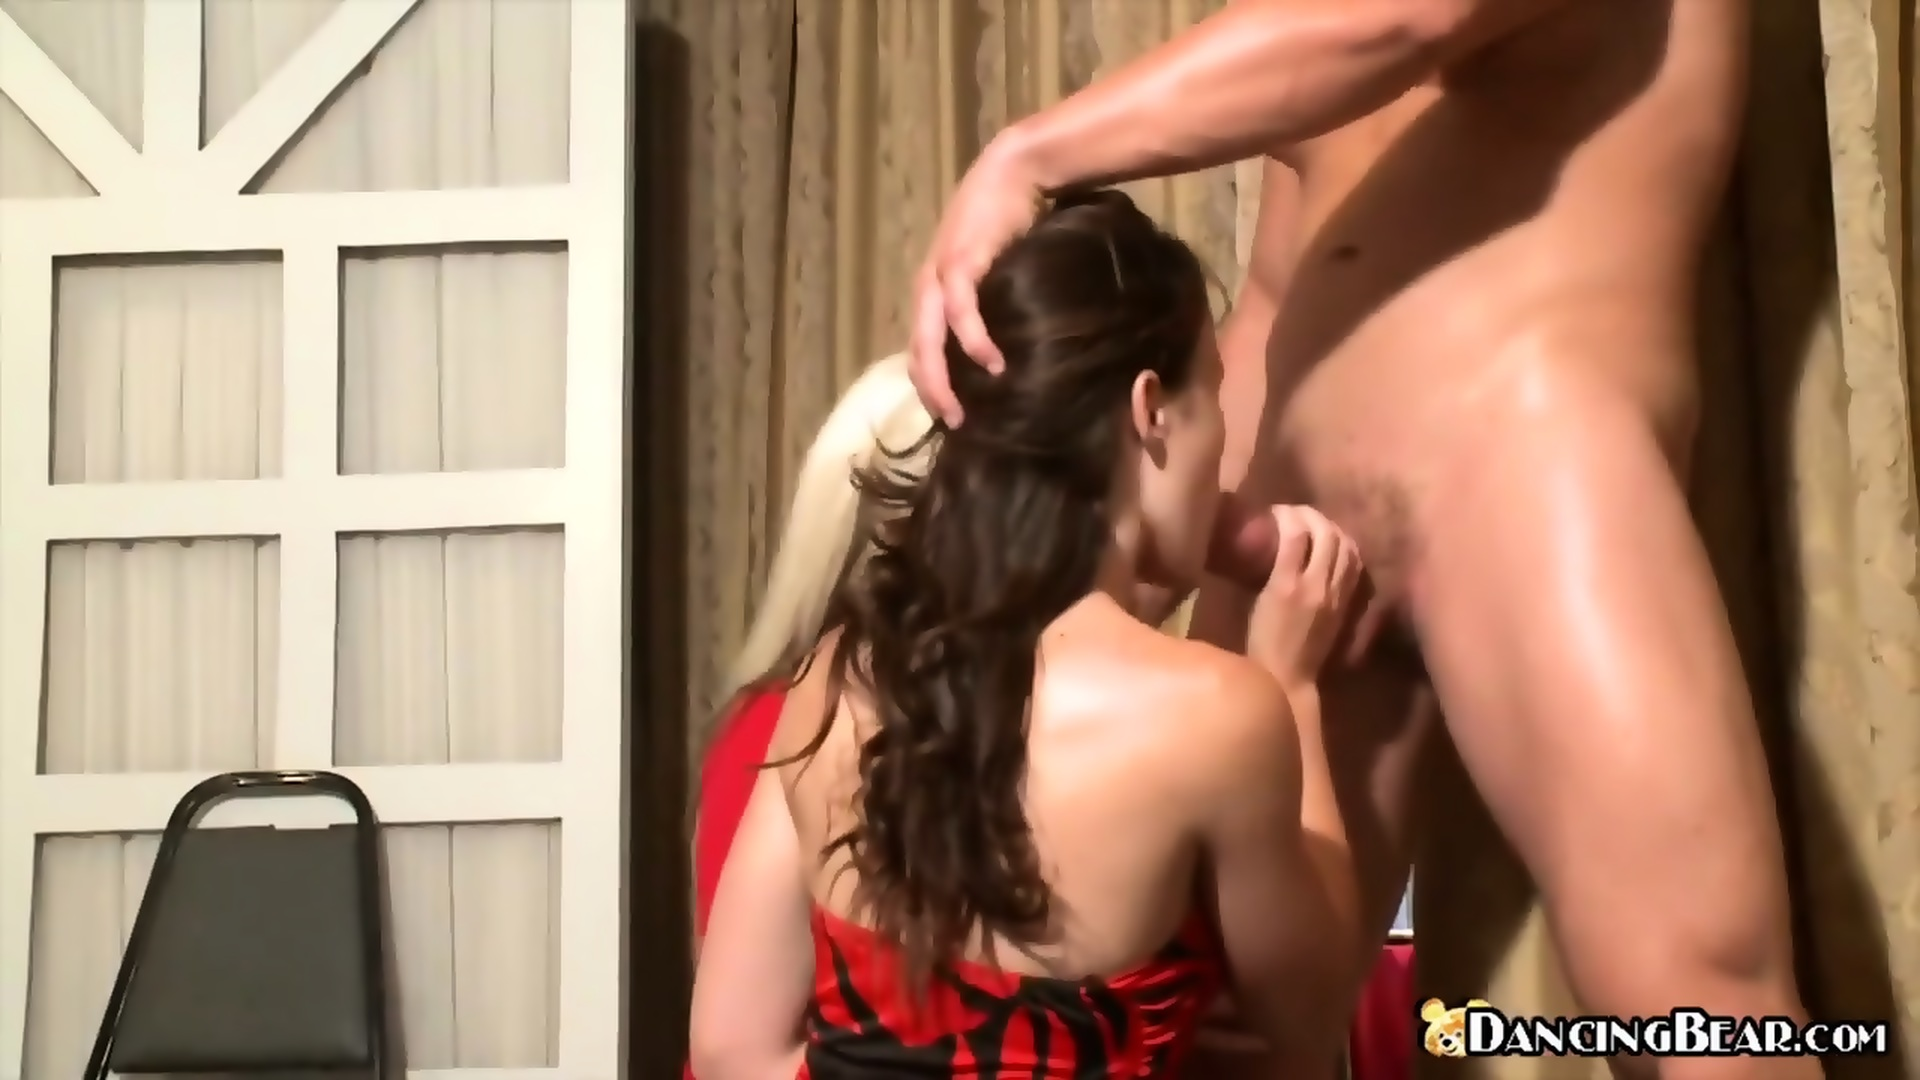 Sex Schwul Video